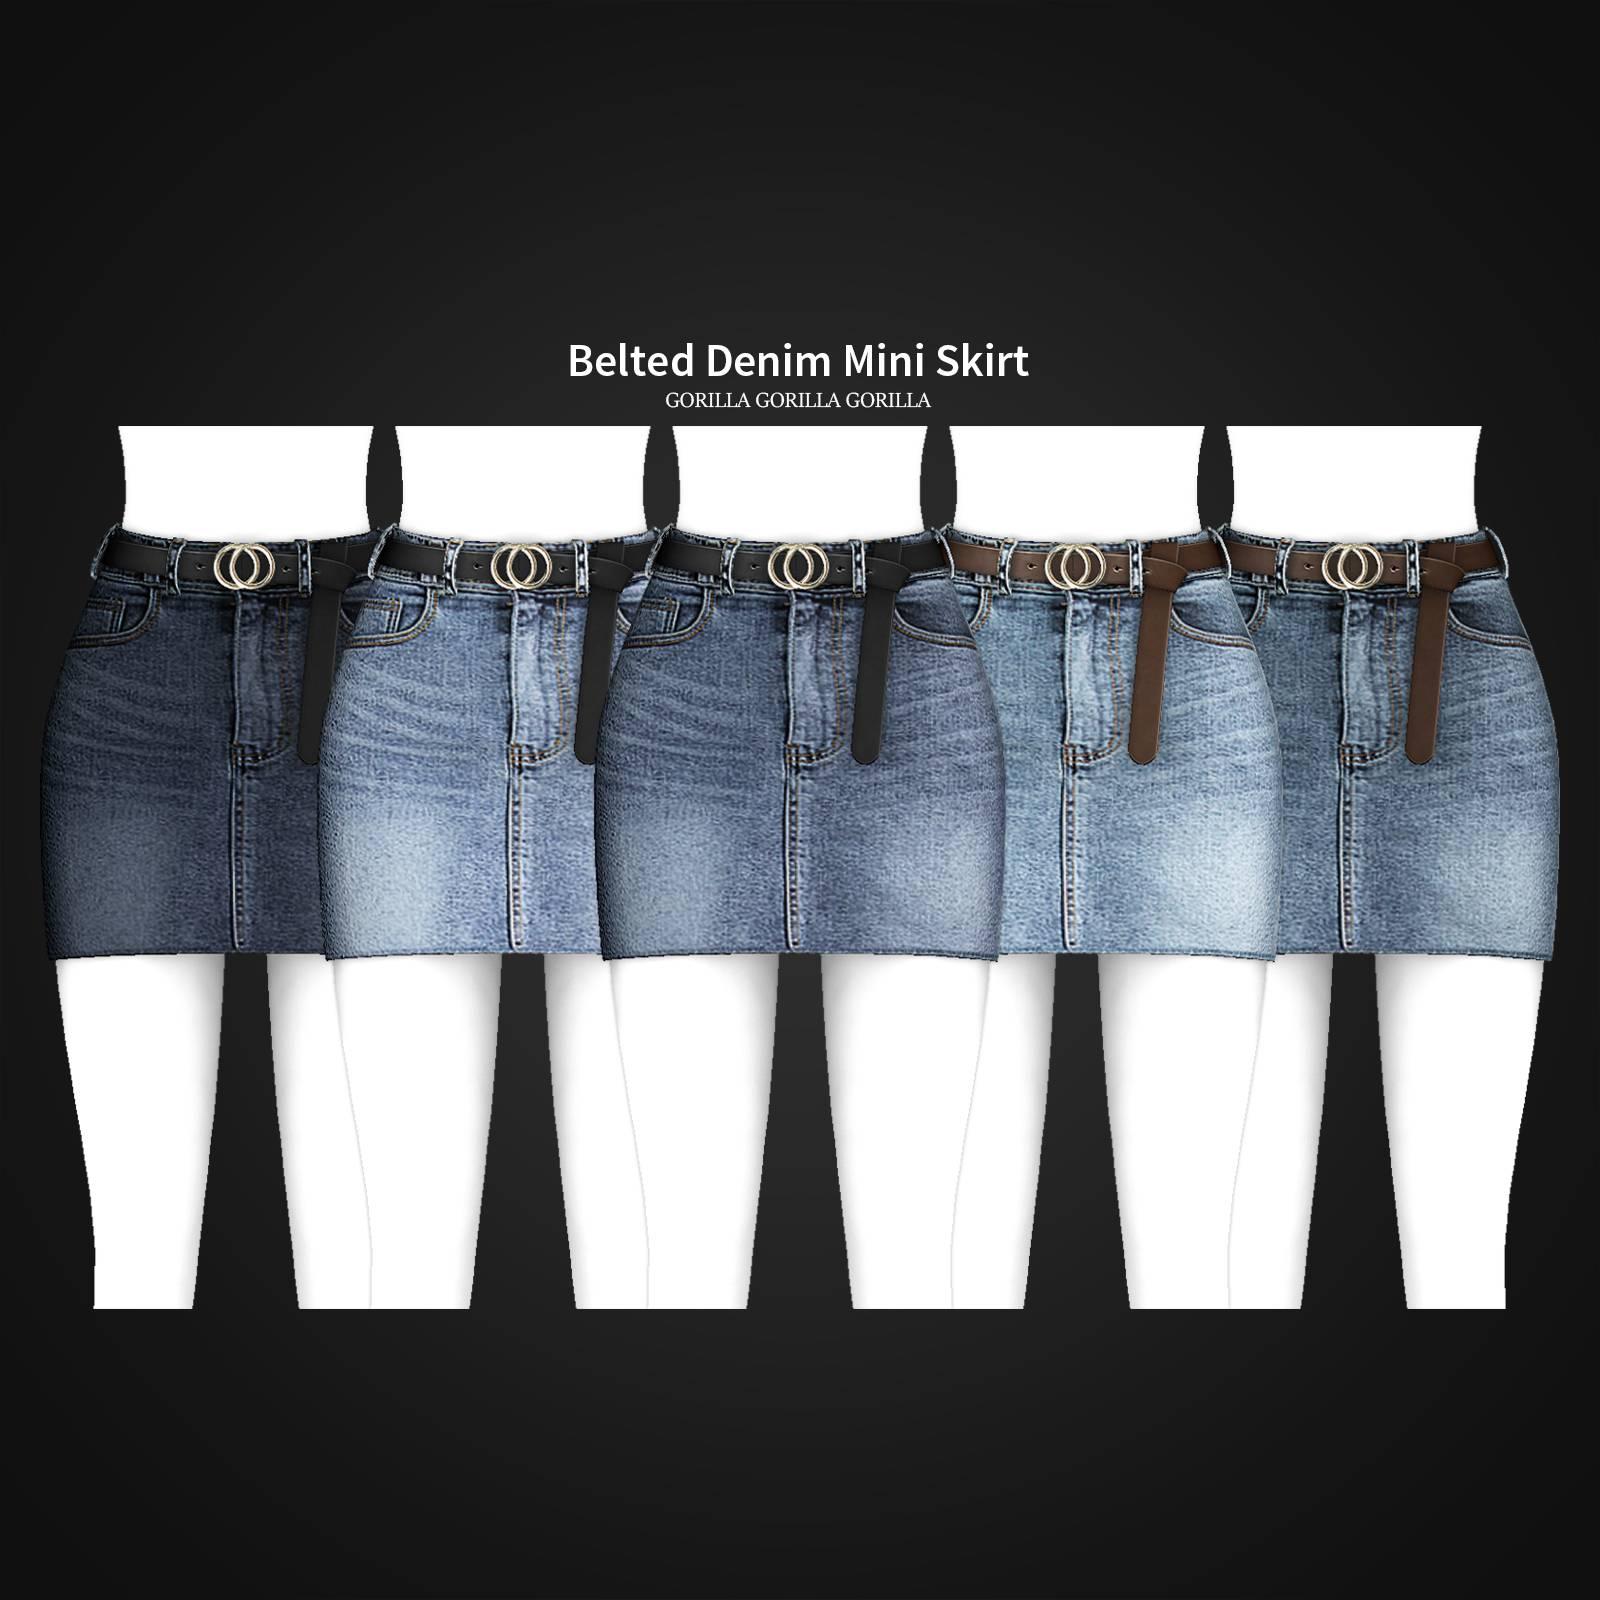 Юбка - Belted Denim Mini Skirt